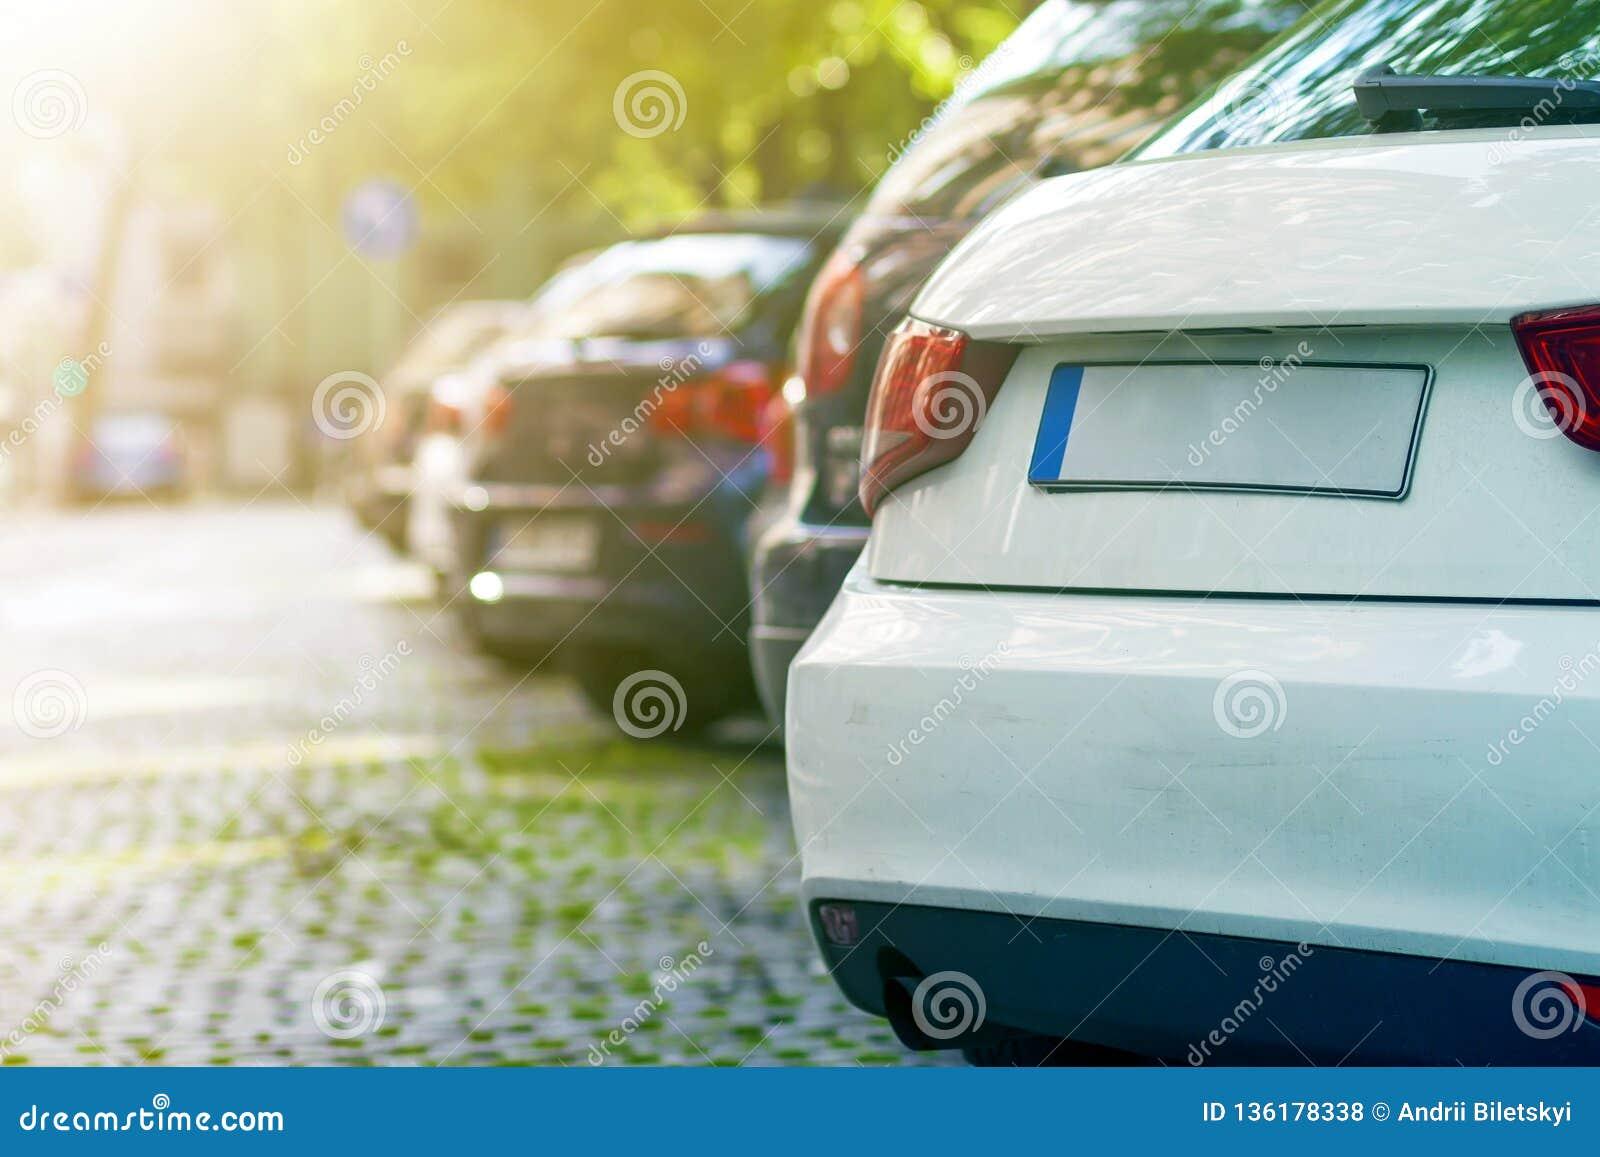 Строки автомобилей припарковали на обочине в жилом районе